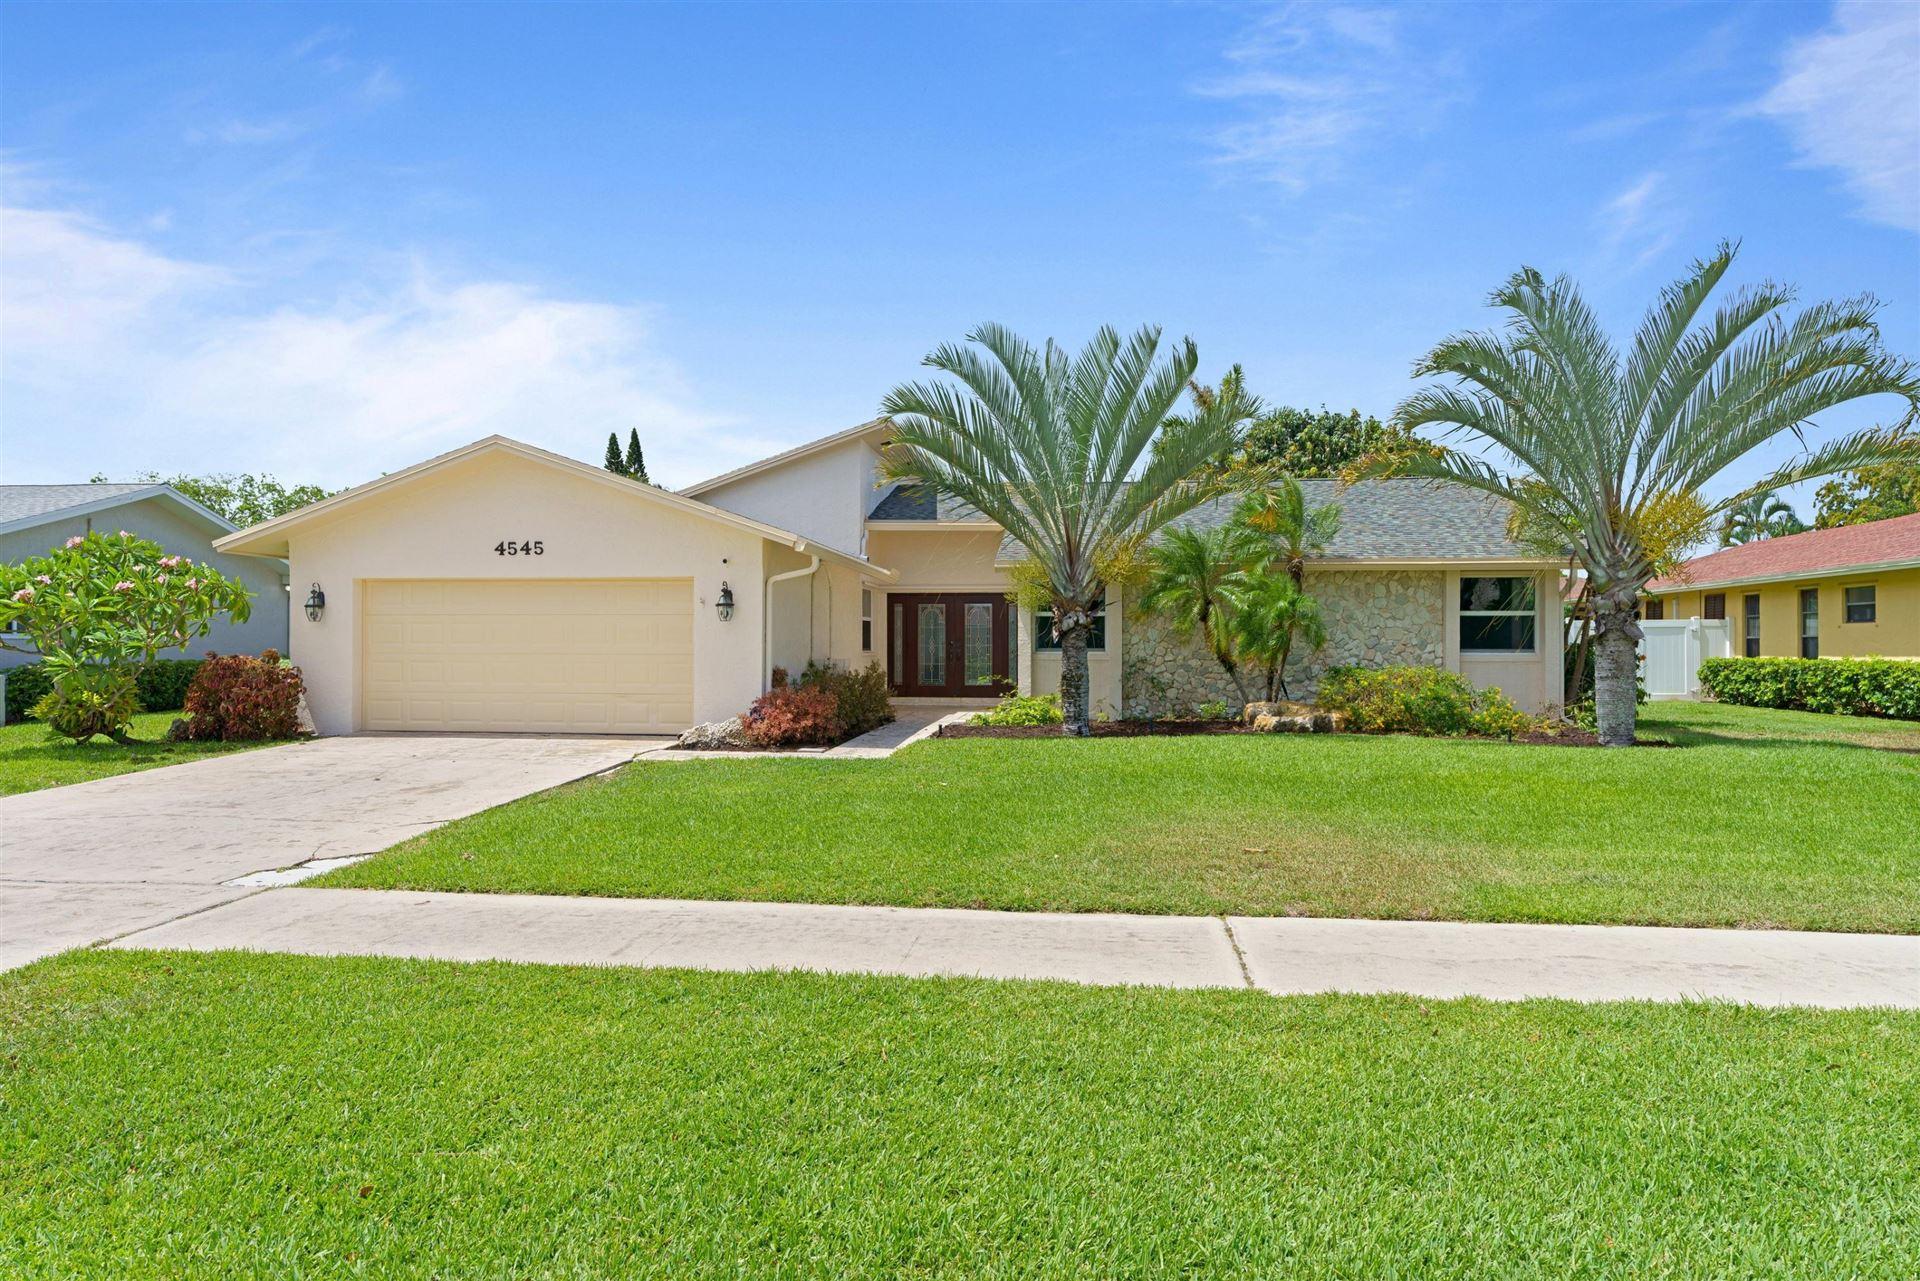 4545 Brandywine Drive, Boca Raton, FL 33487 - MLS#: RX-10716714